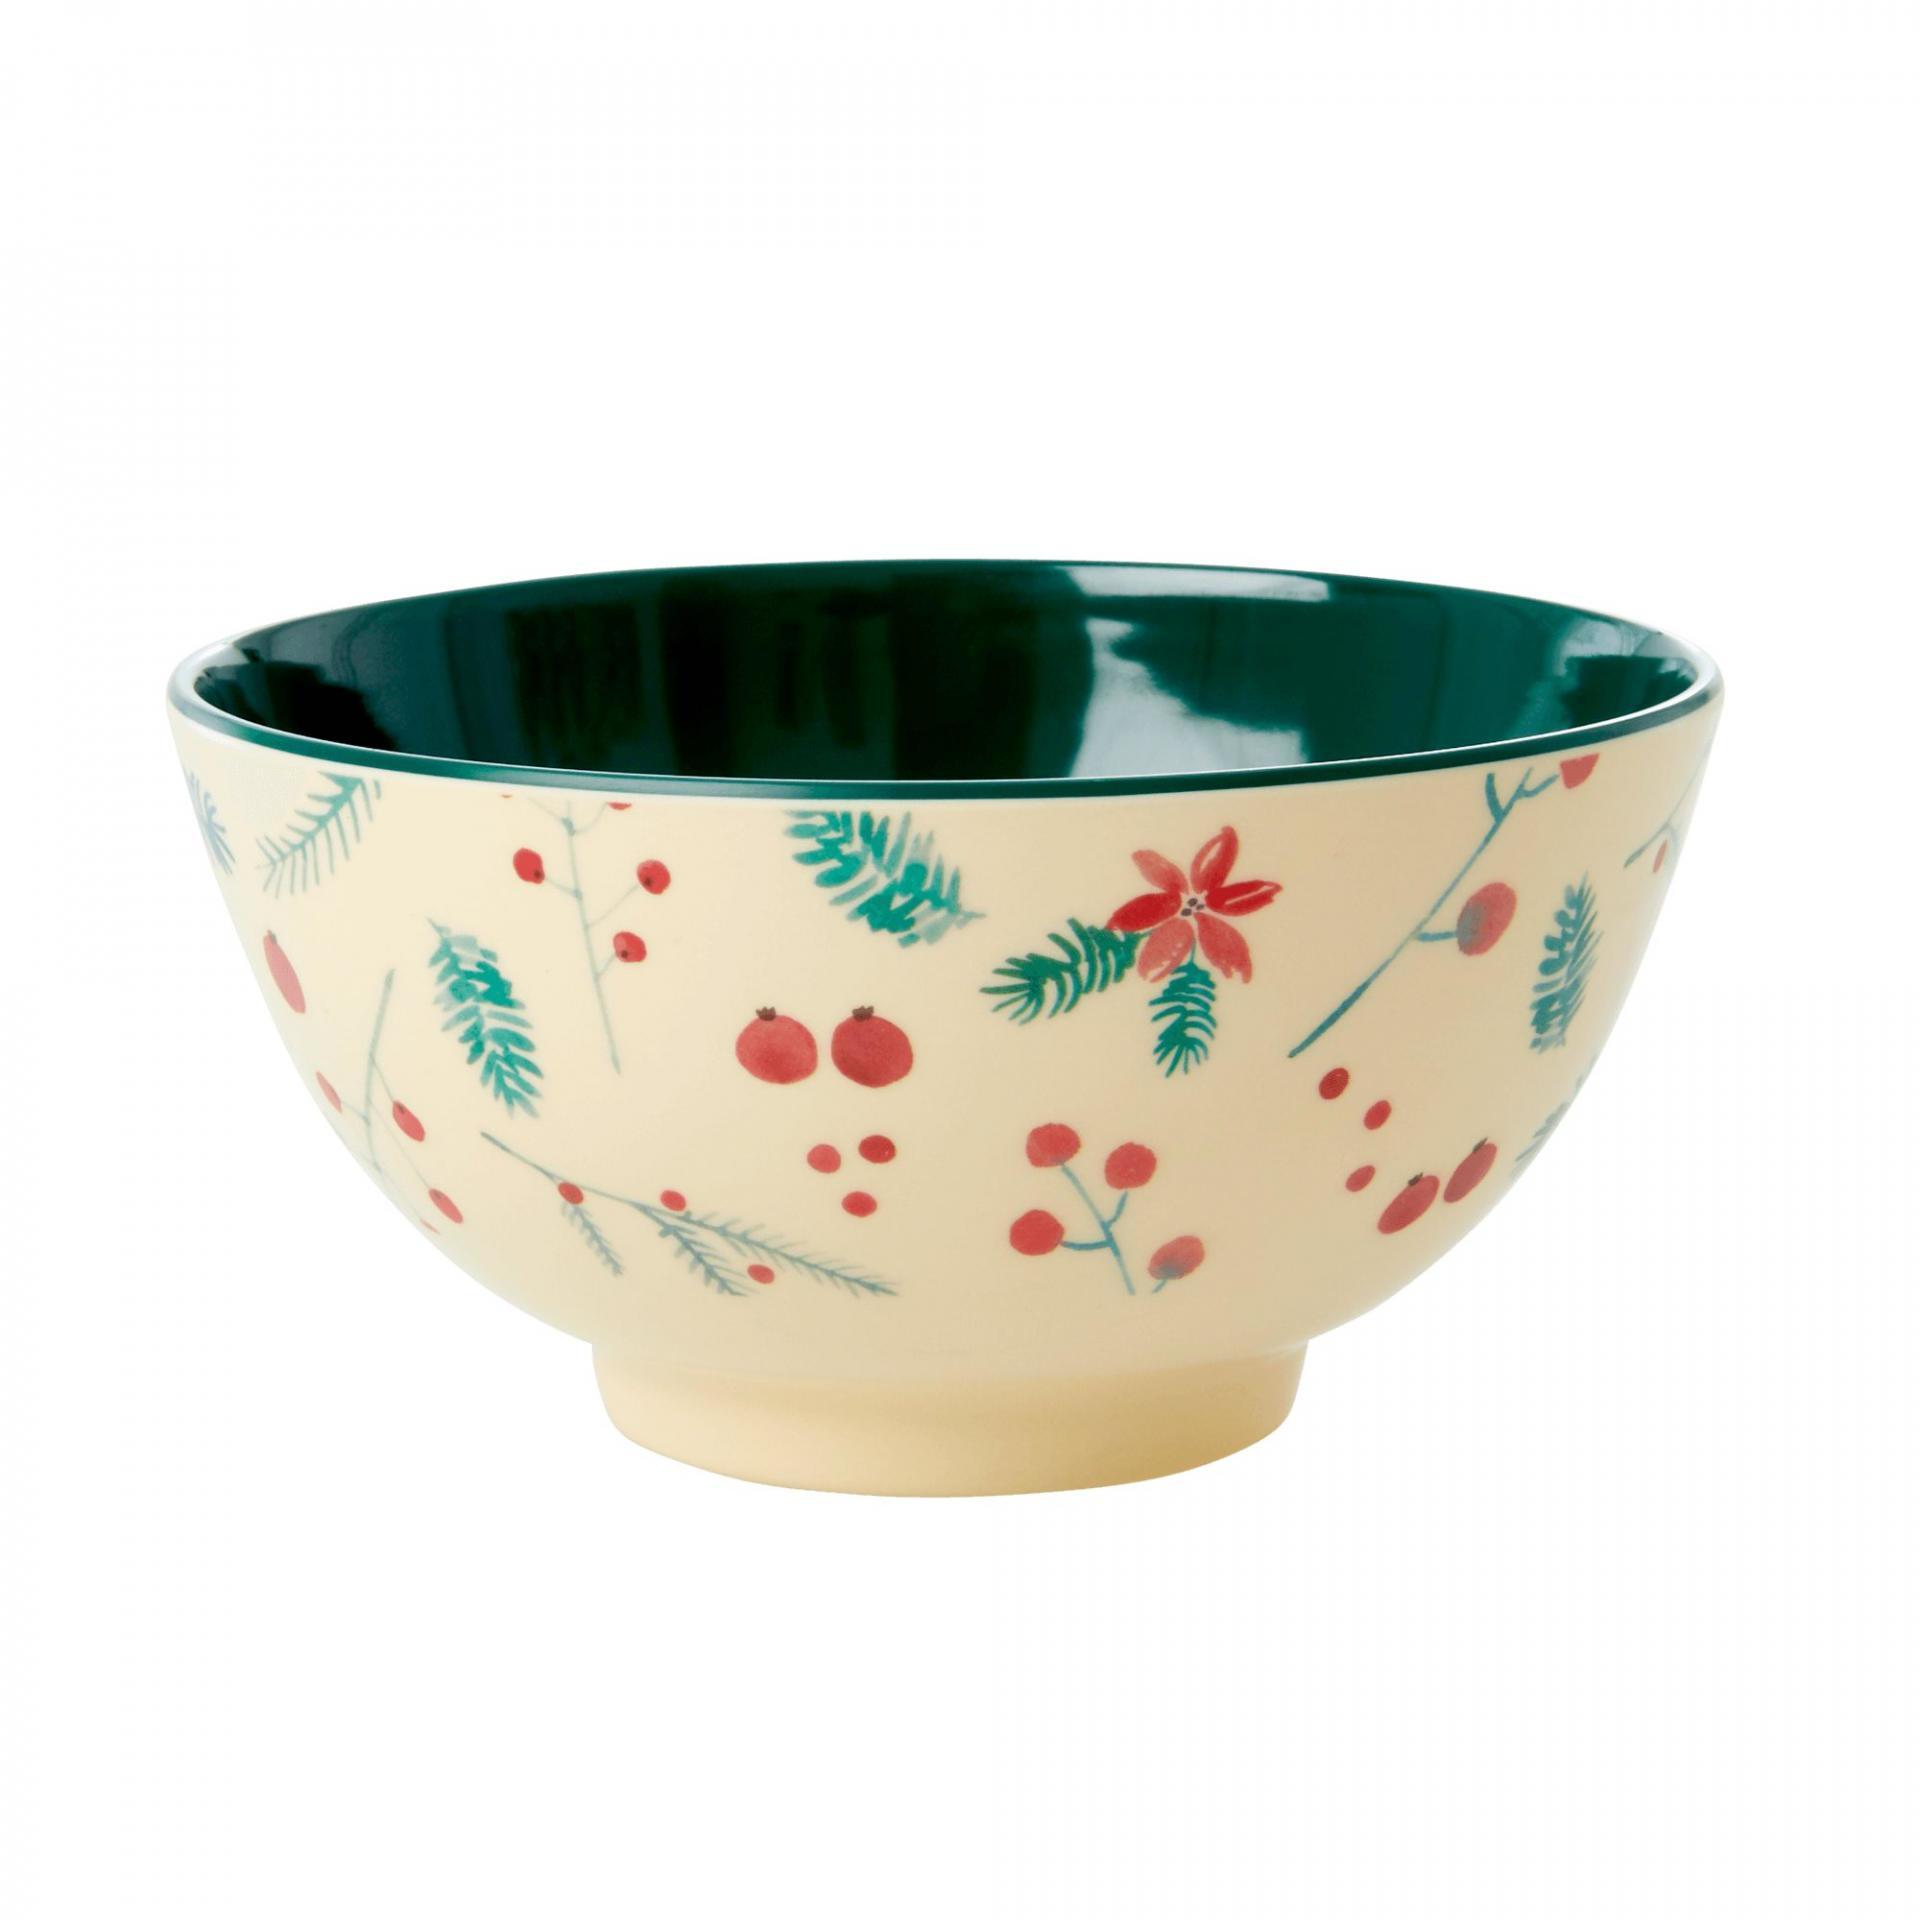 rice Melaminová miska Poinsettia, krémová barva, melamin